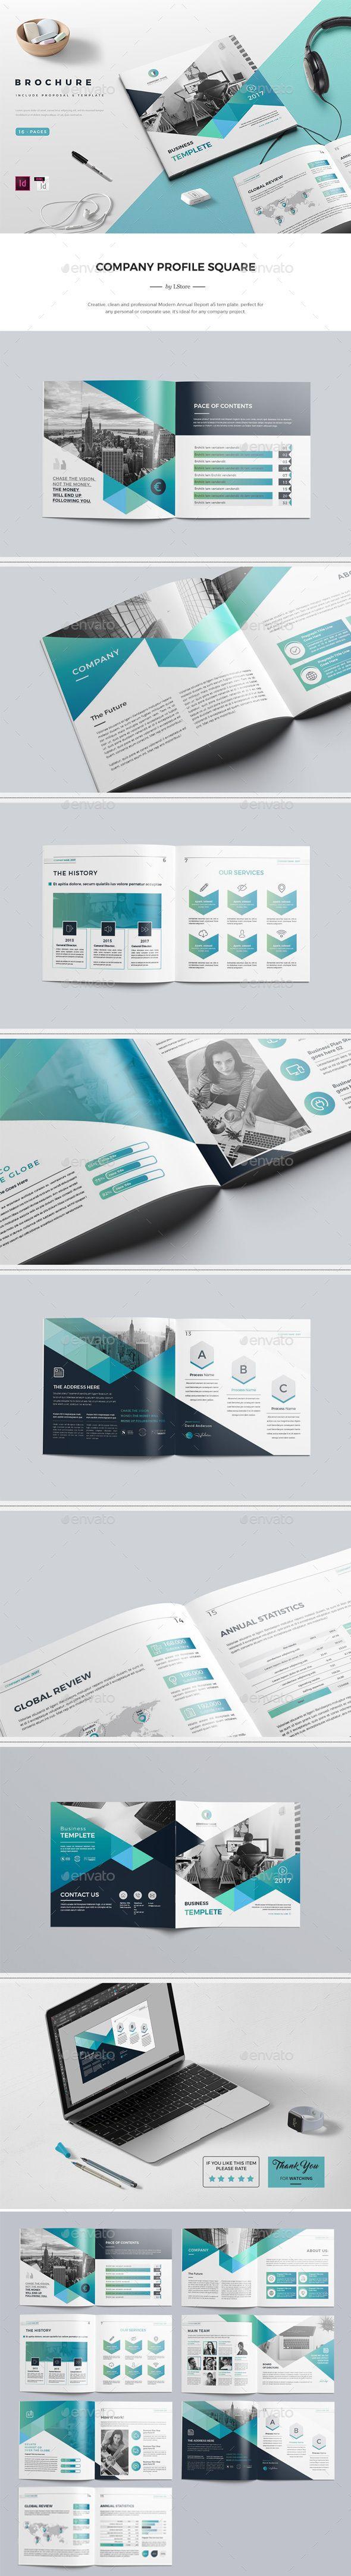 Company Profile Square Brochure. 16 Pages